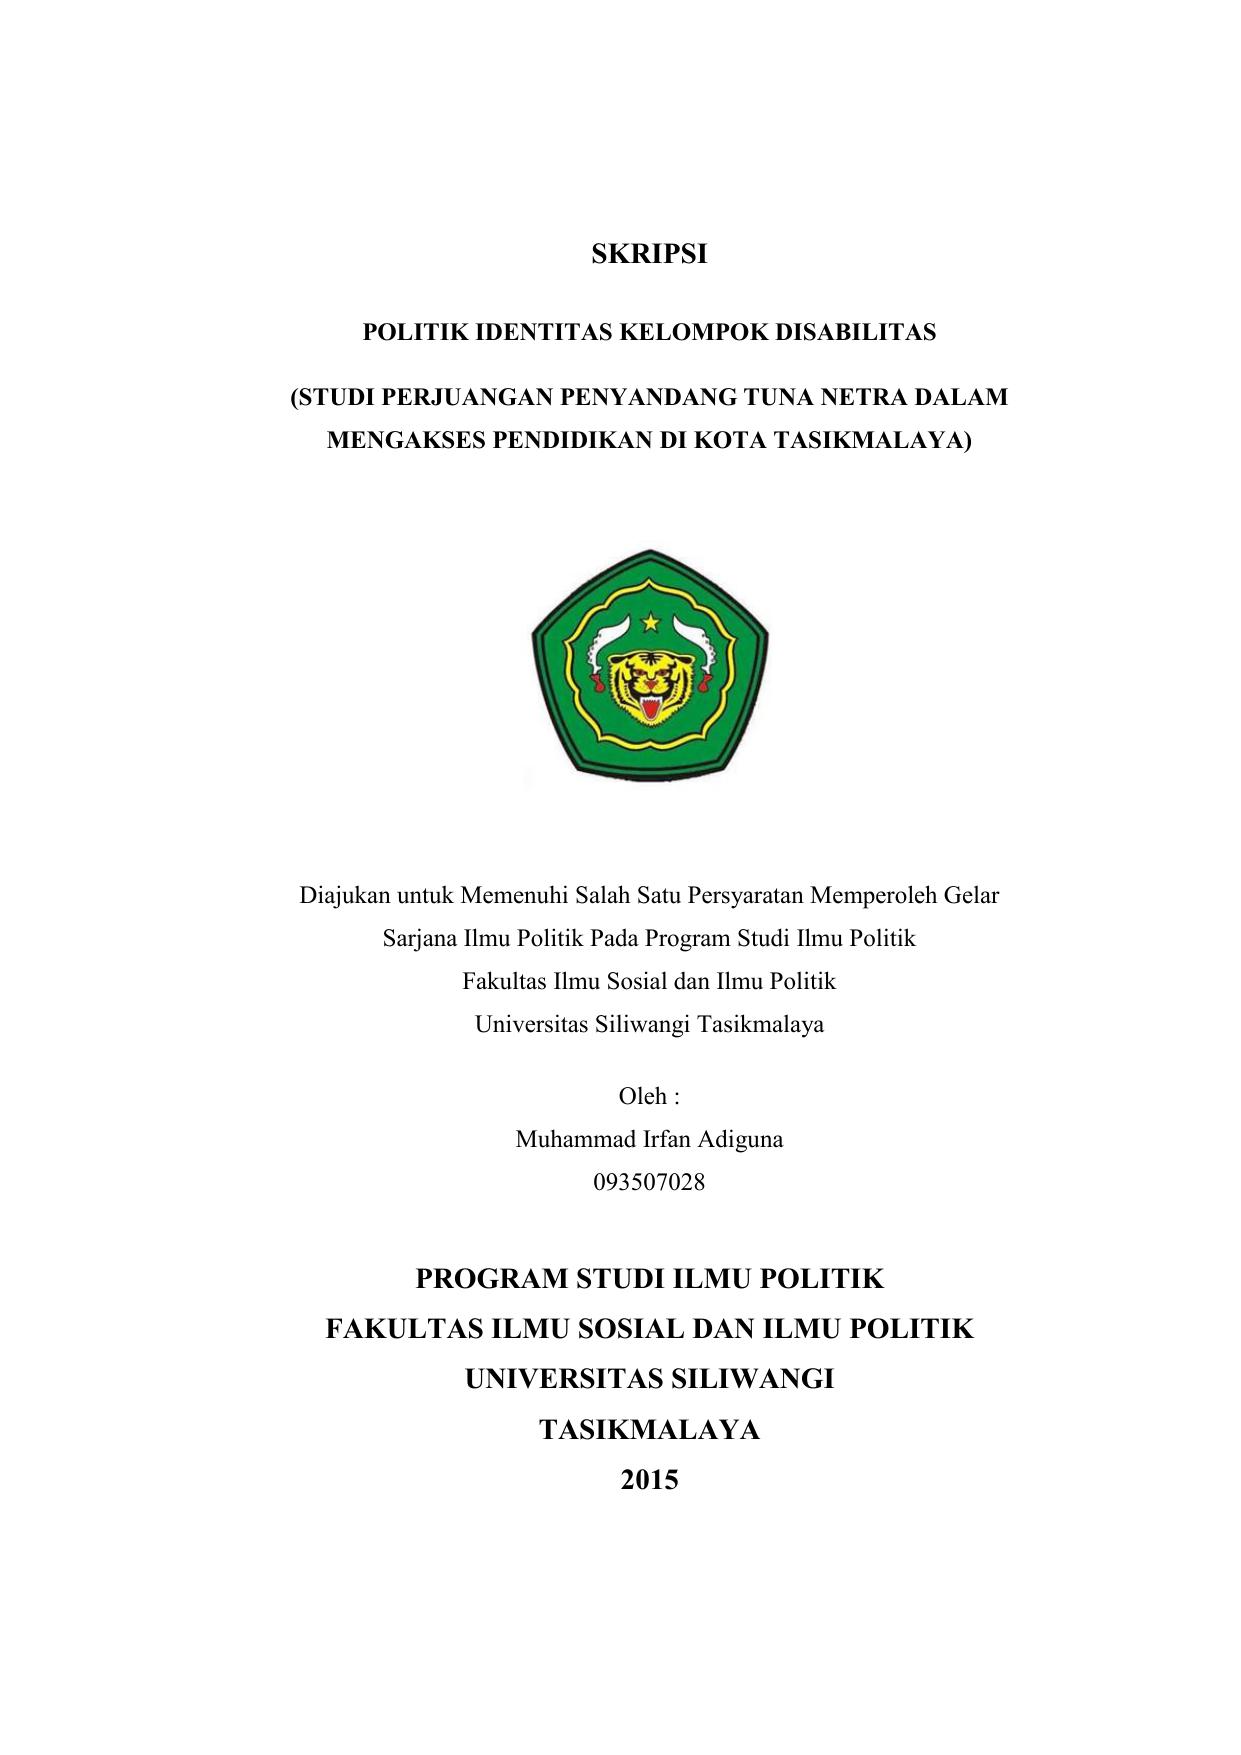 Skripsi Program Studi Ilmu Politik Fakultas Ilmu Sosial